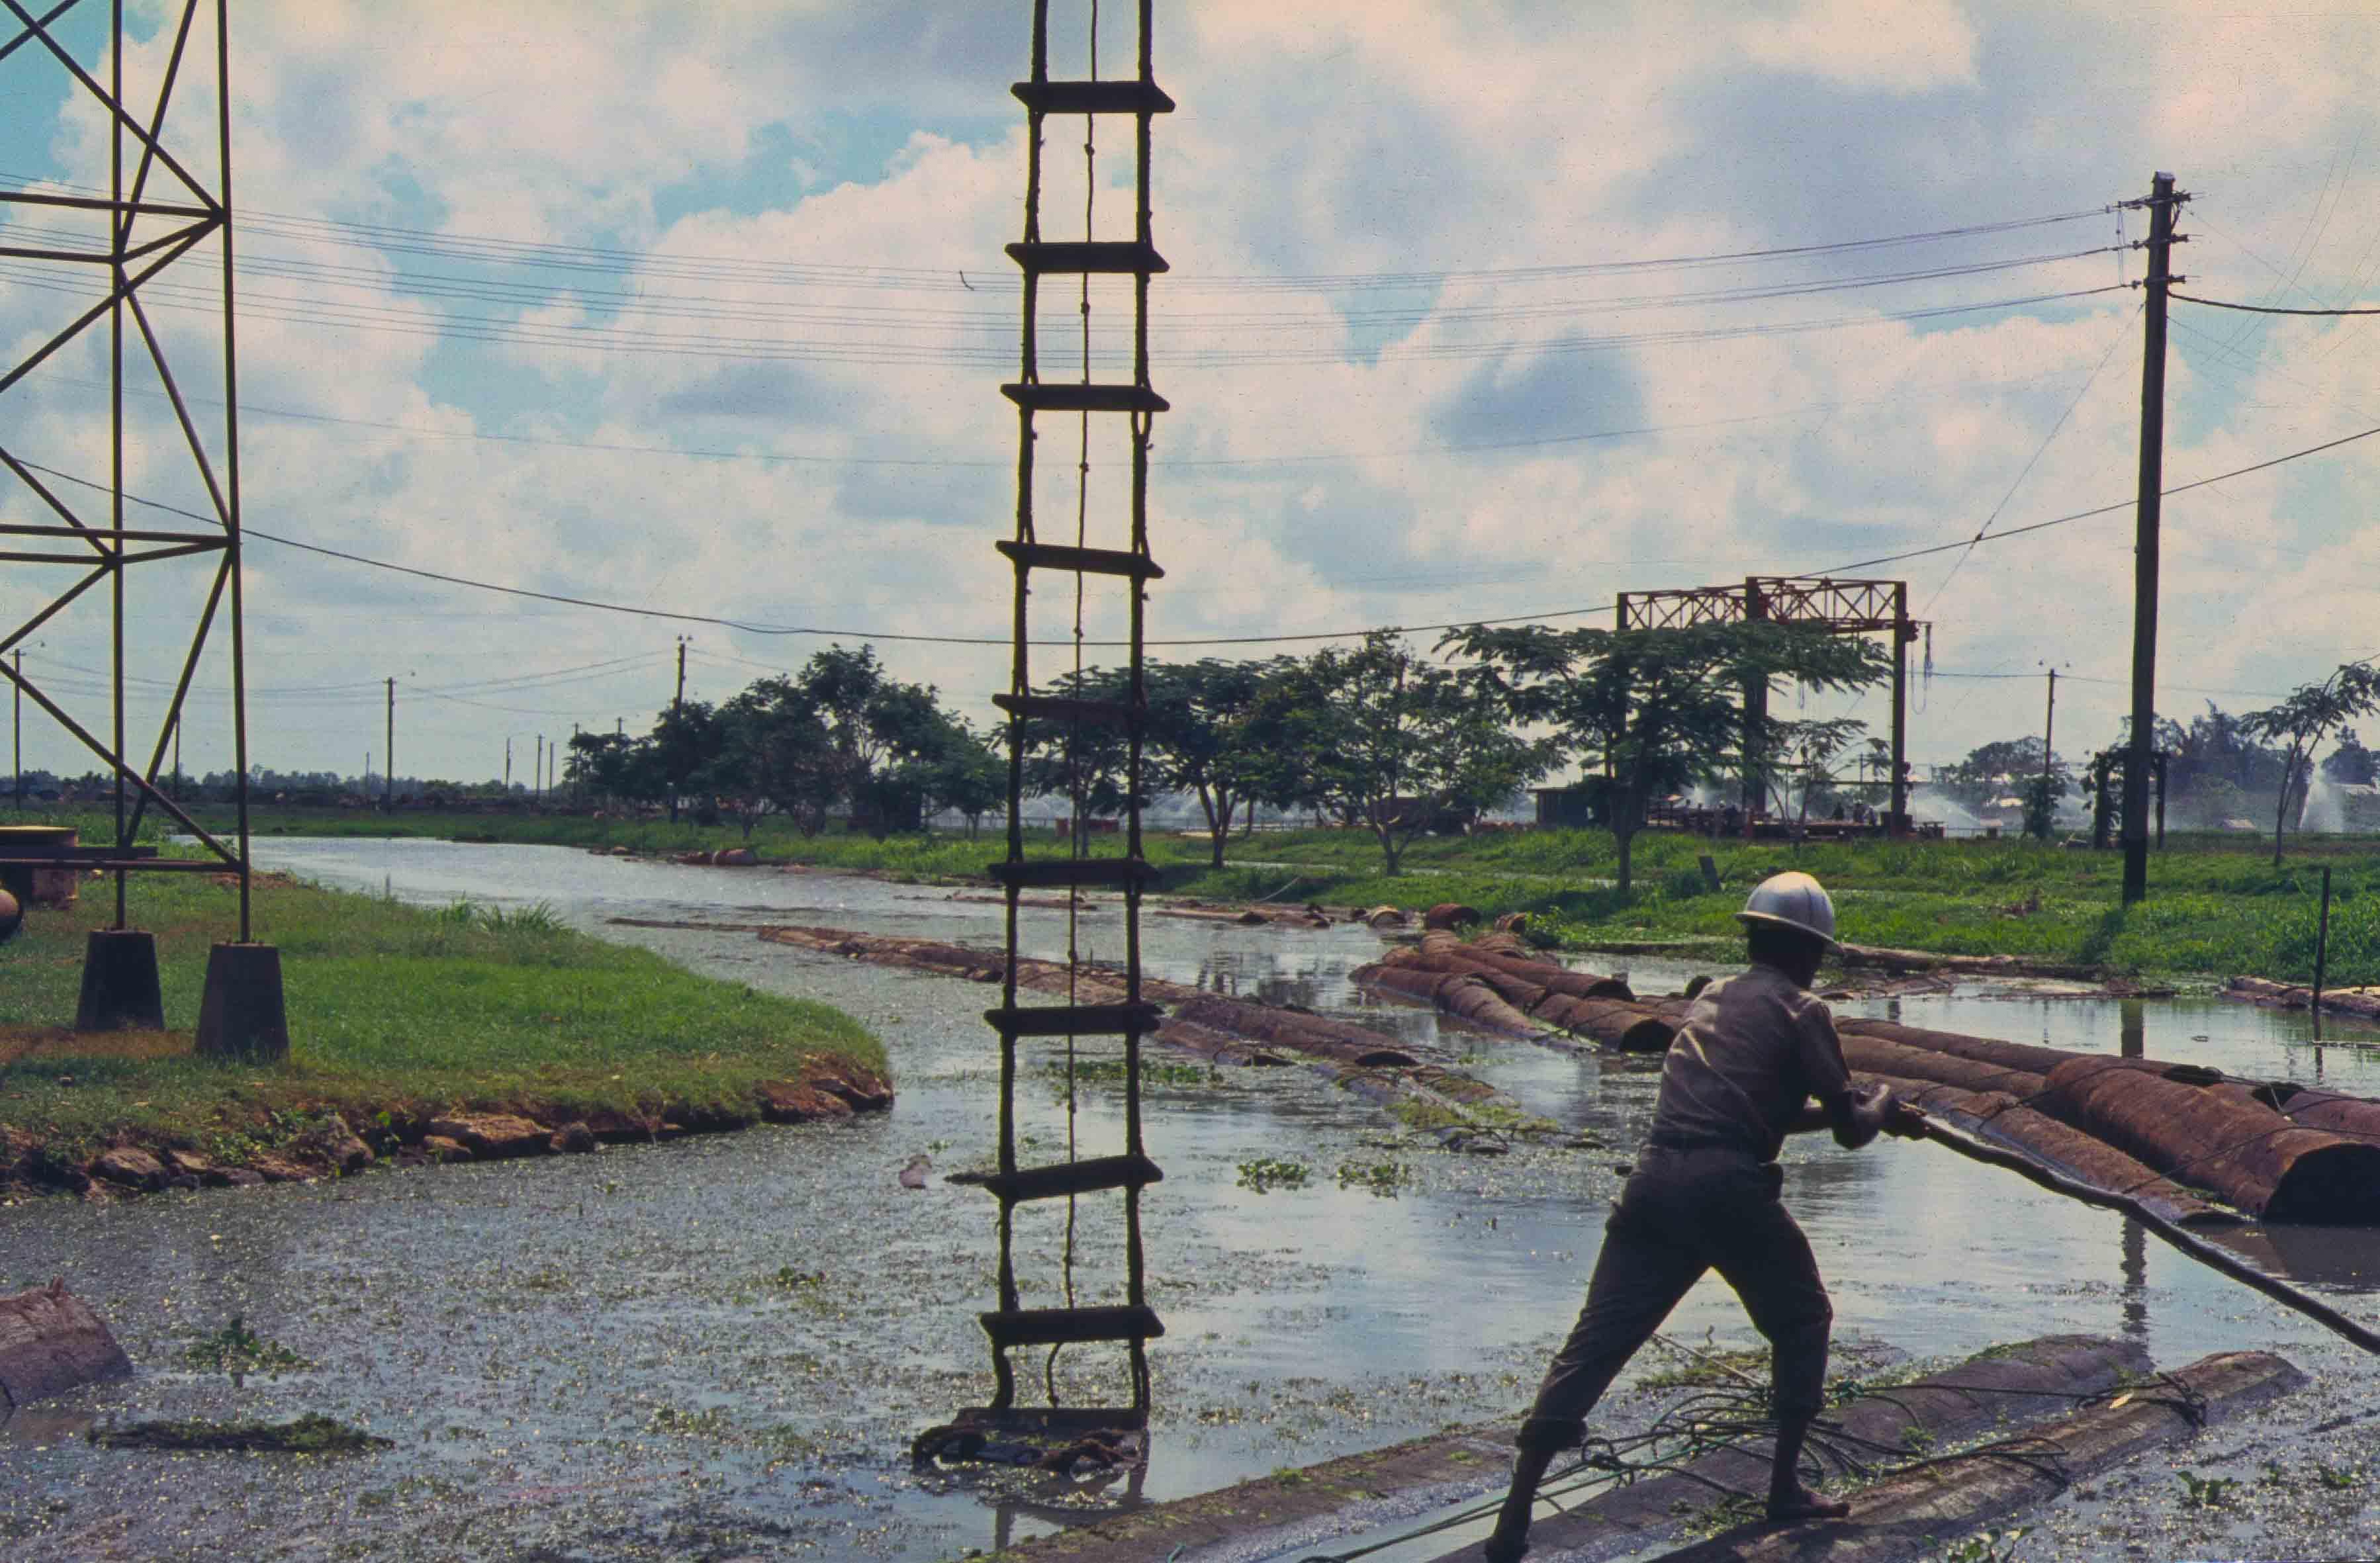 565. Suriname